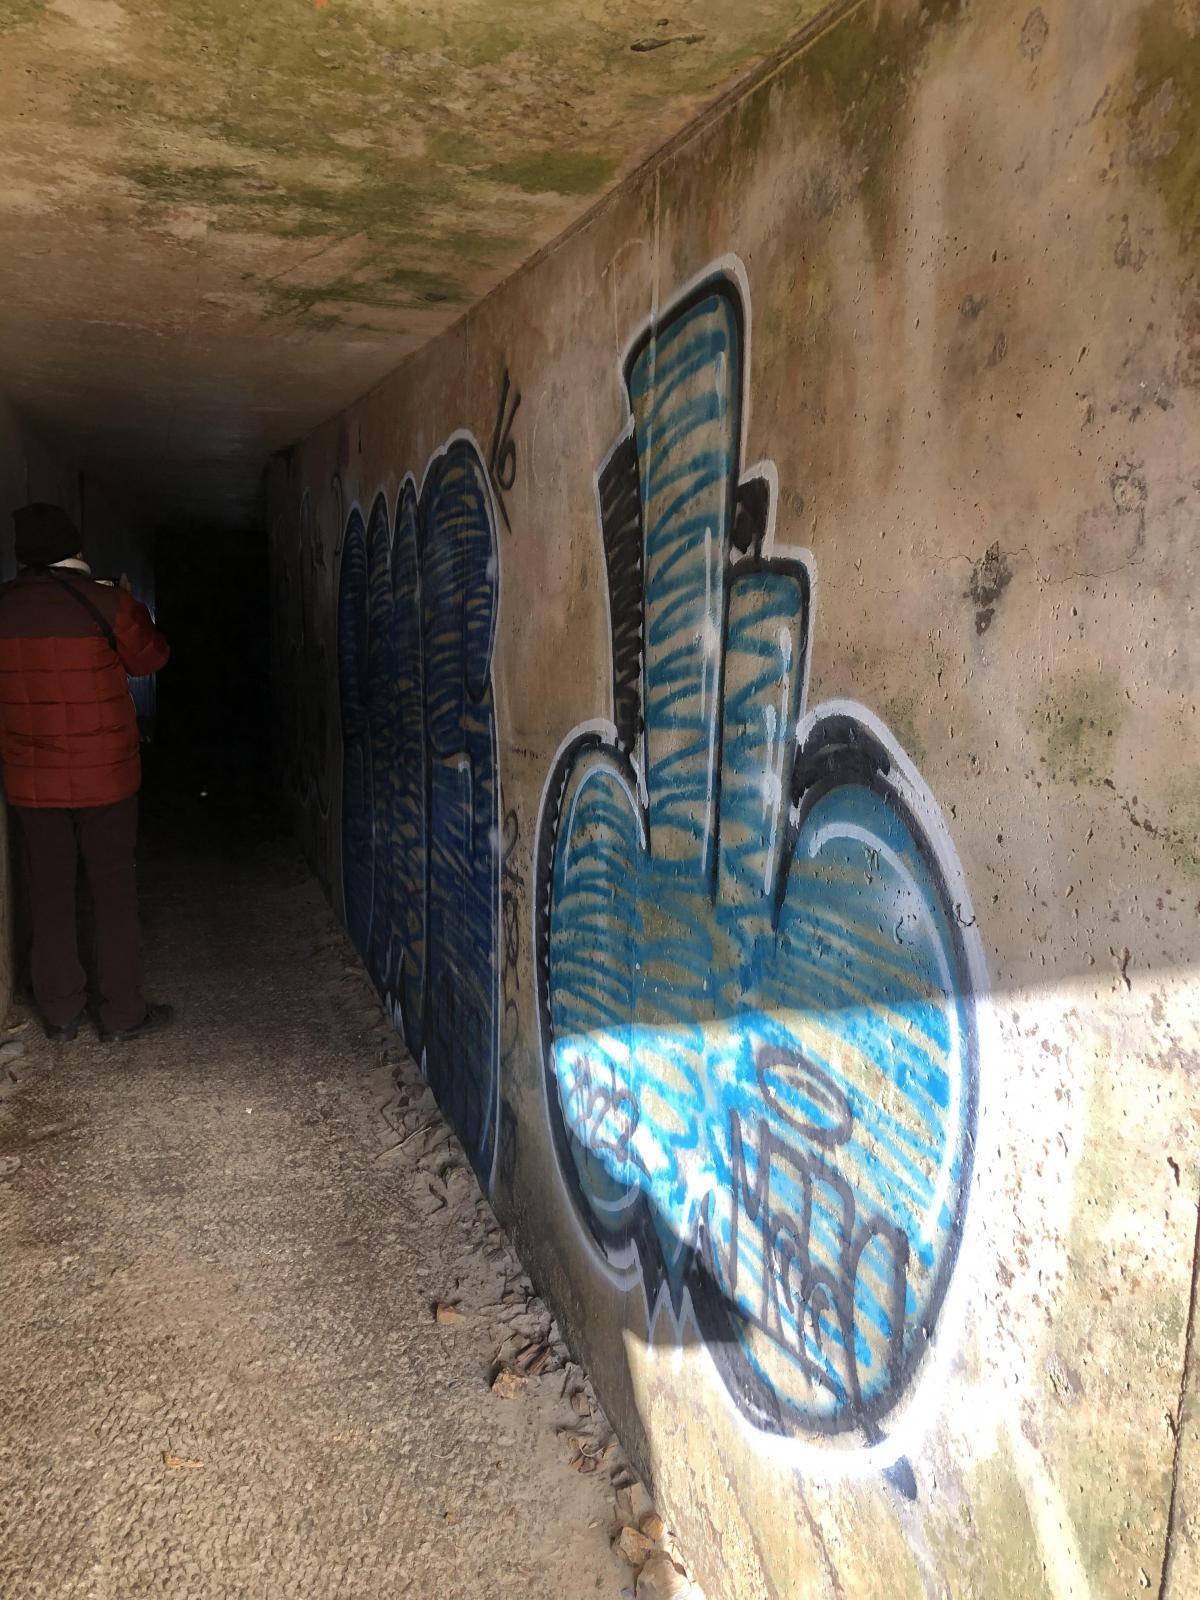 Graffiti inside Maxwell Point tunnel